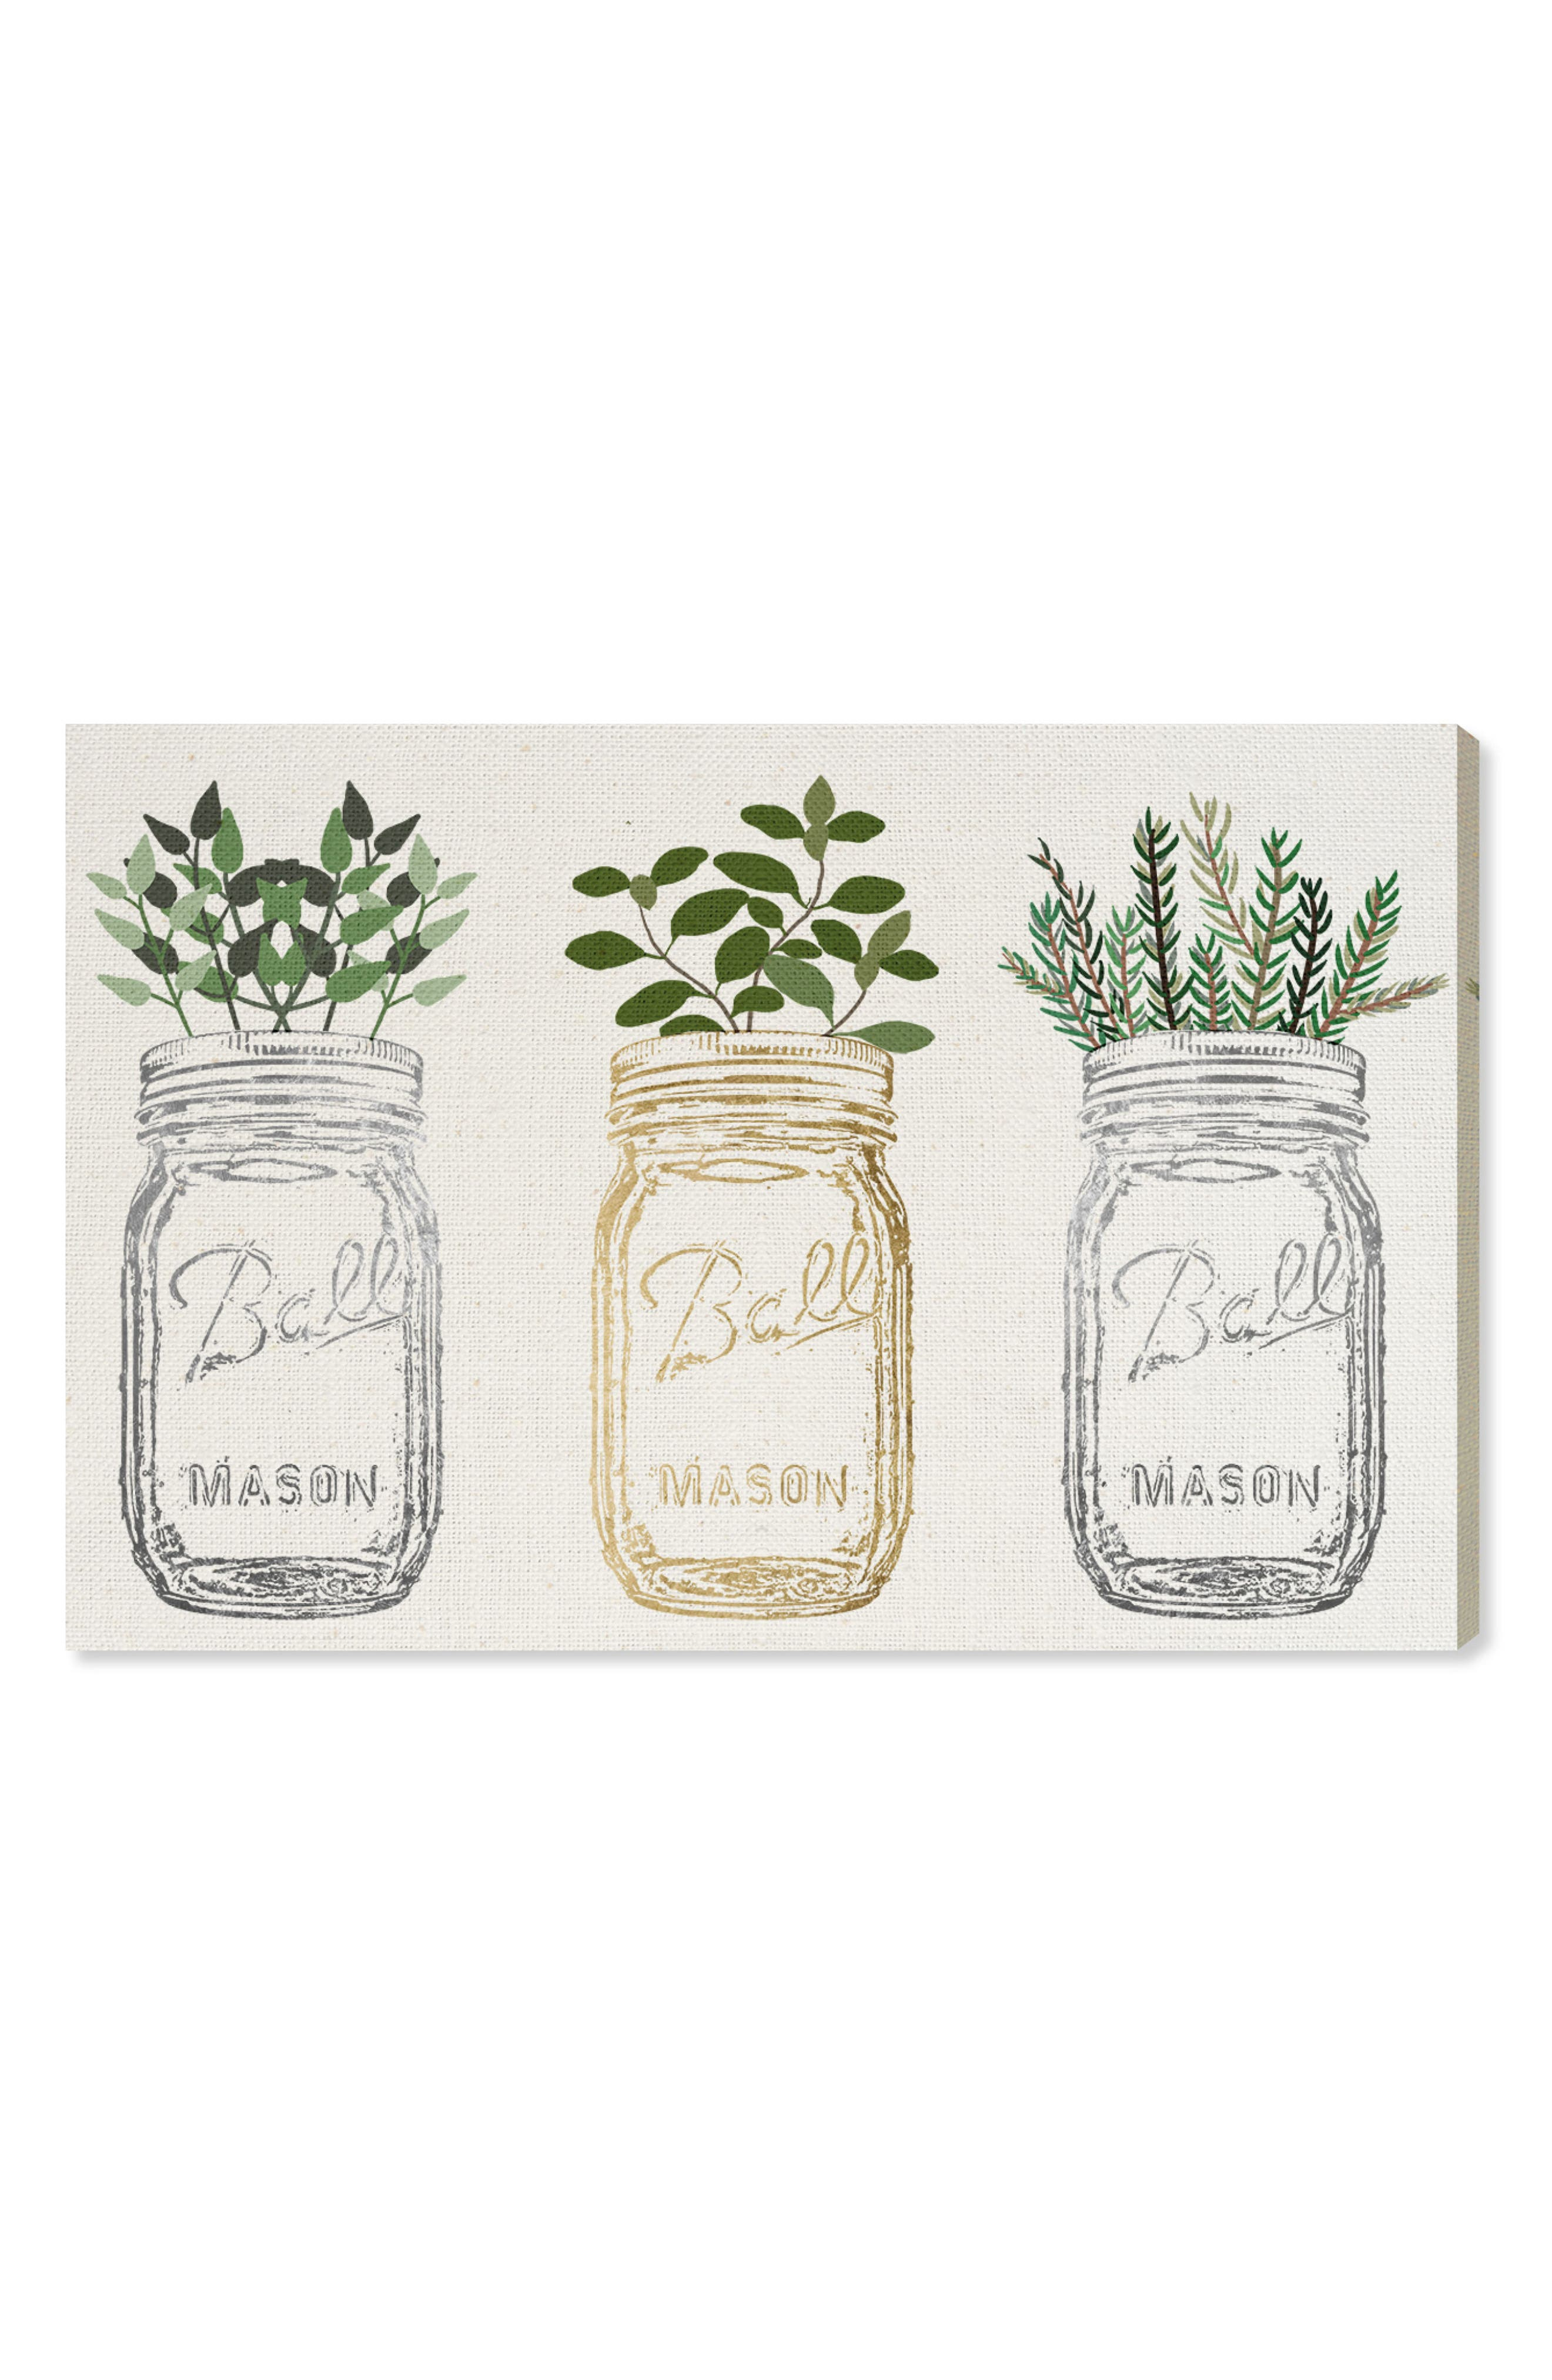 Mason Jars & Plants Canvas Wall Art,                         Main,                         color, White